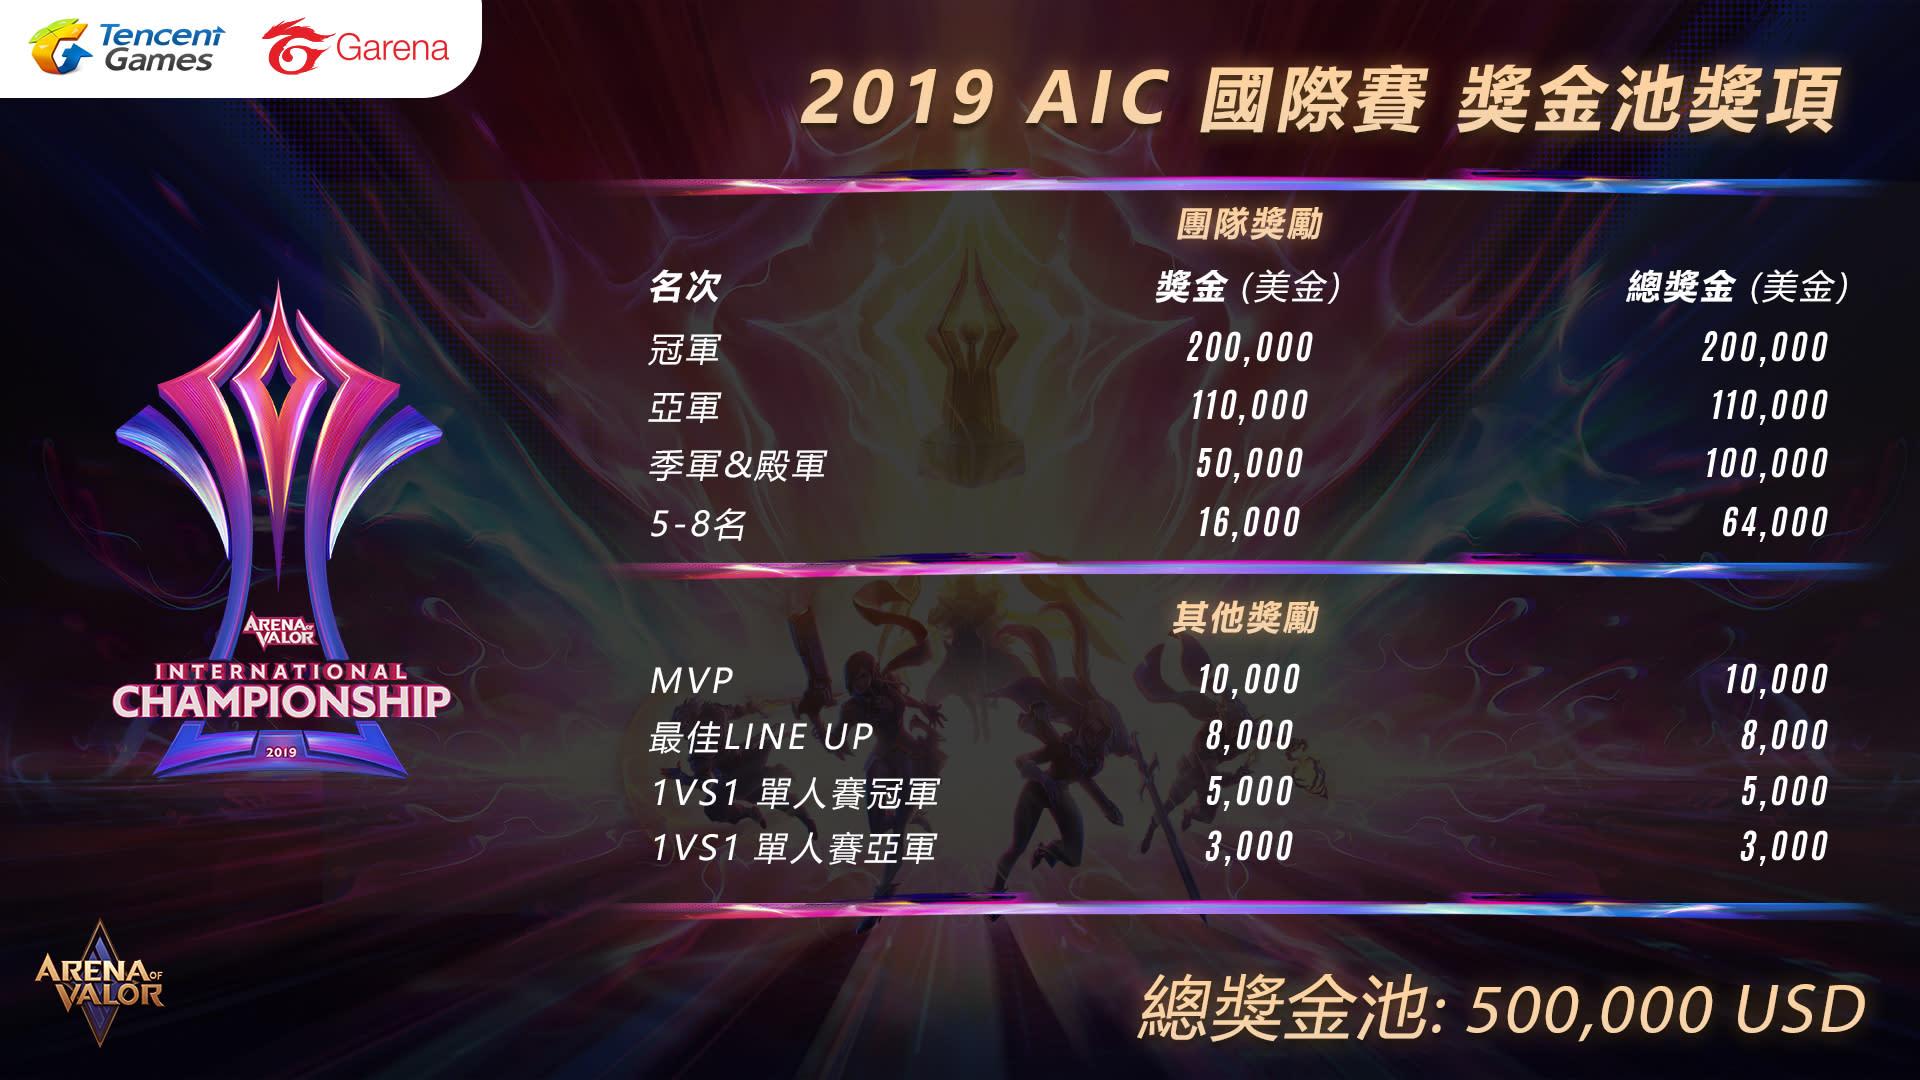 2019 AIC國際賽增加全新賽程1V1單挑賽